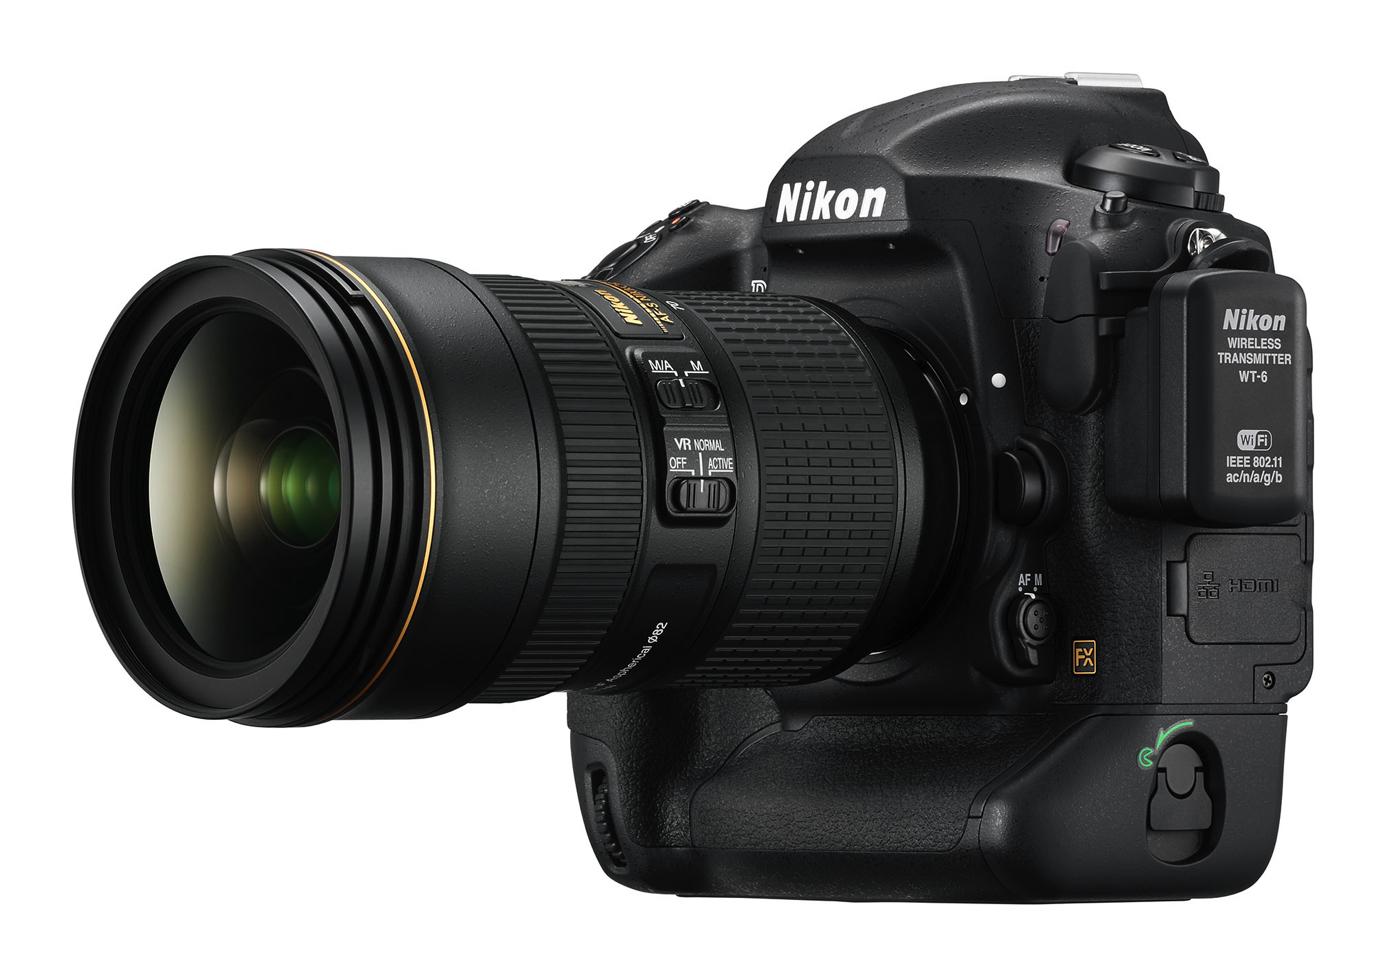 Camera Nikon Camera Dslr Models nikon announces the d5 its new flagship dslr camera